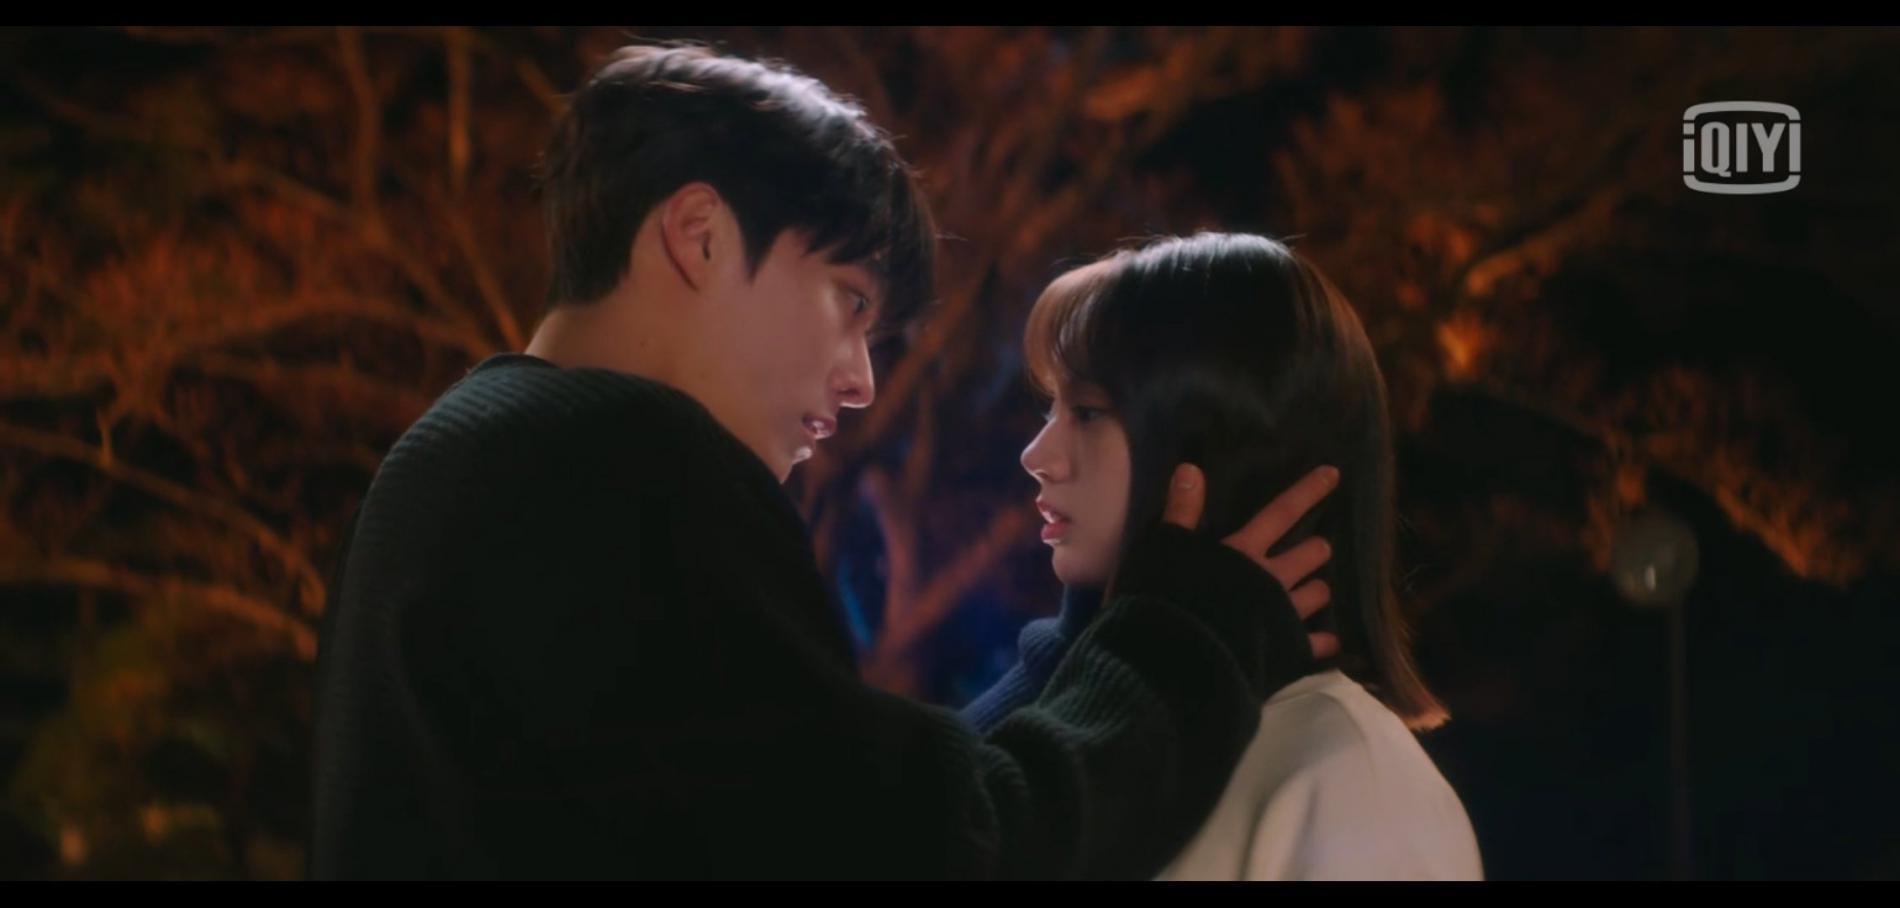 Drama Korea My Roommate Is a Gumiho Episode 2 Sub Indo, Sisi Baik Tuan Rubah